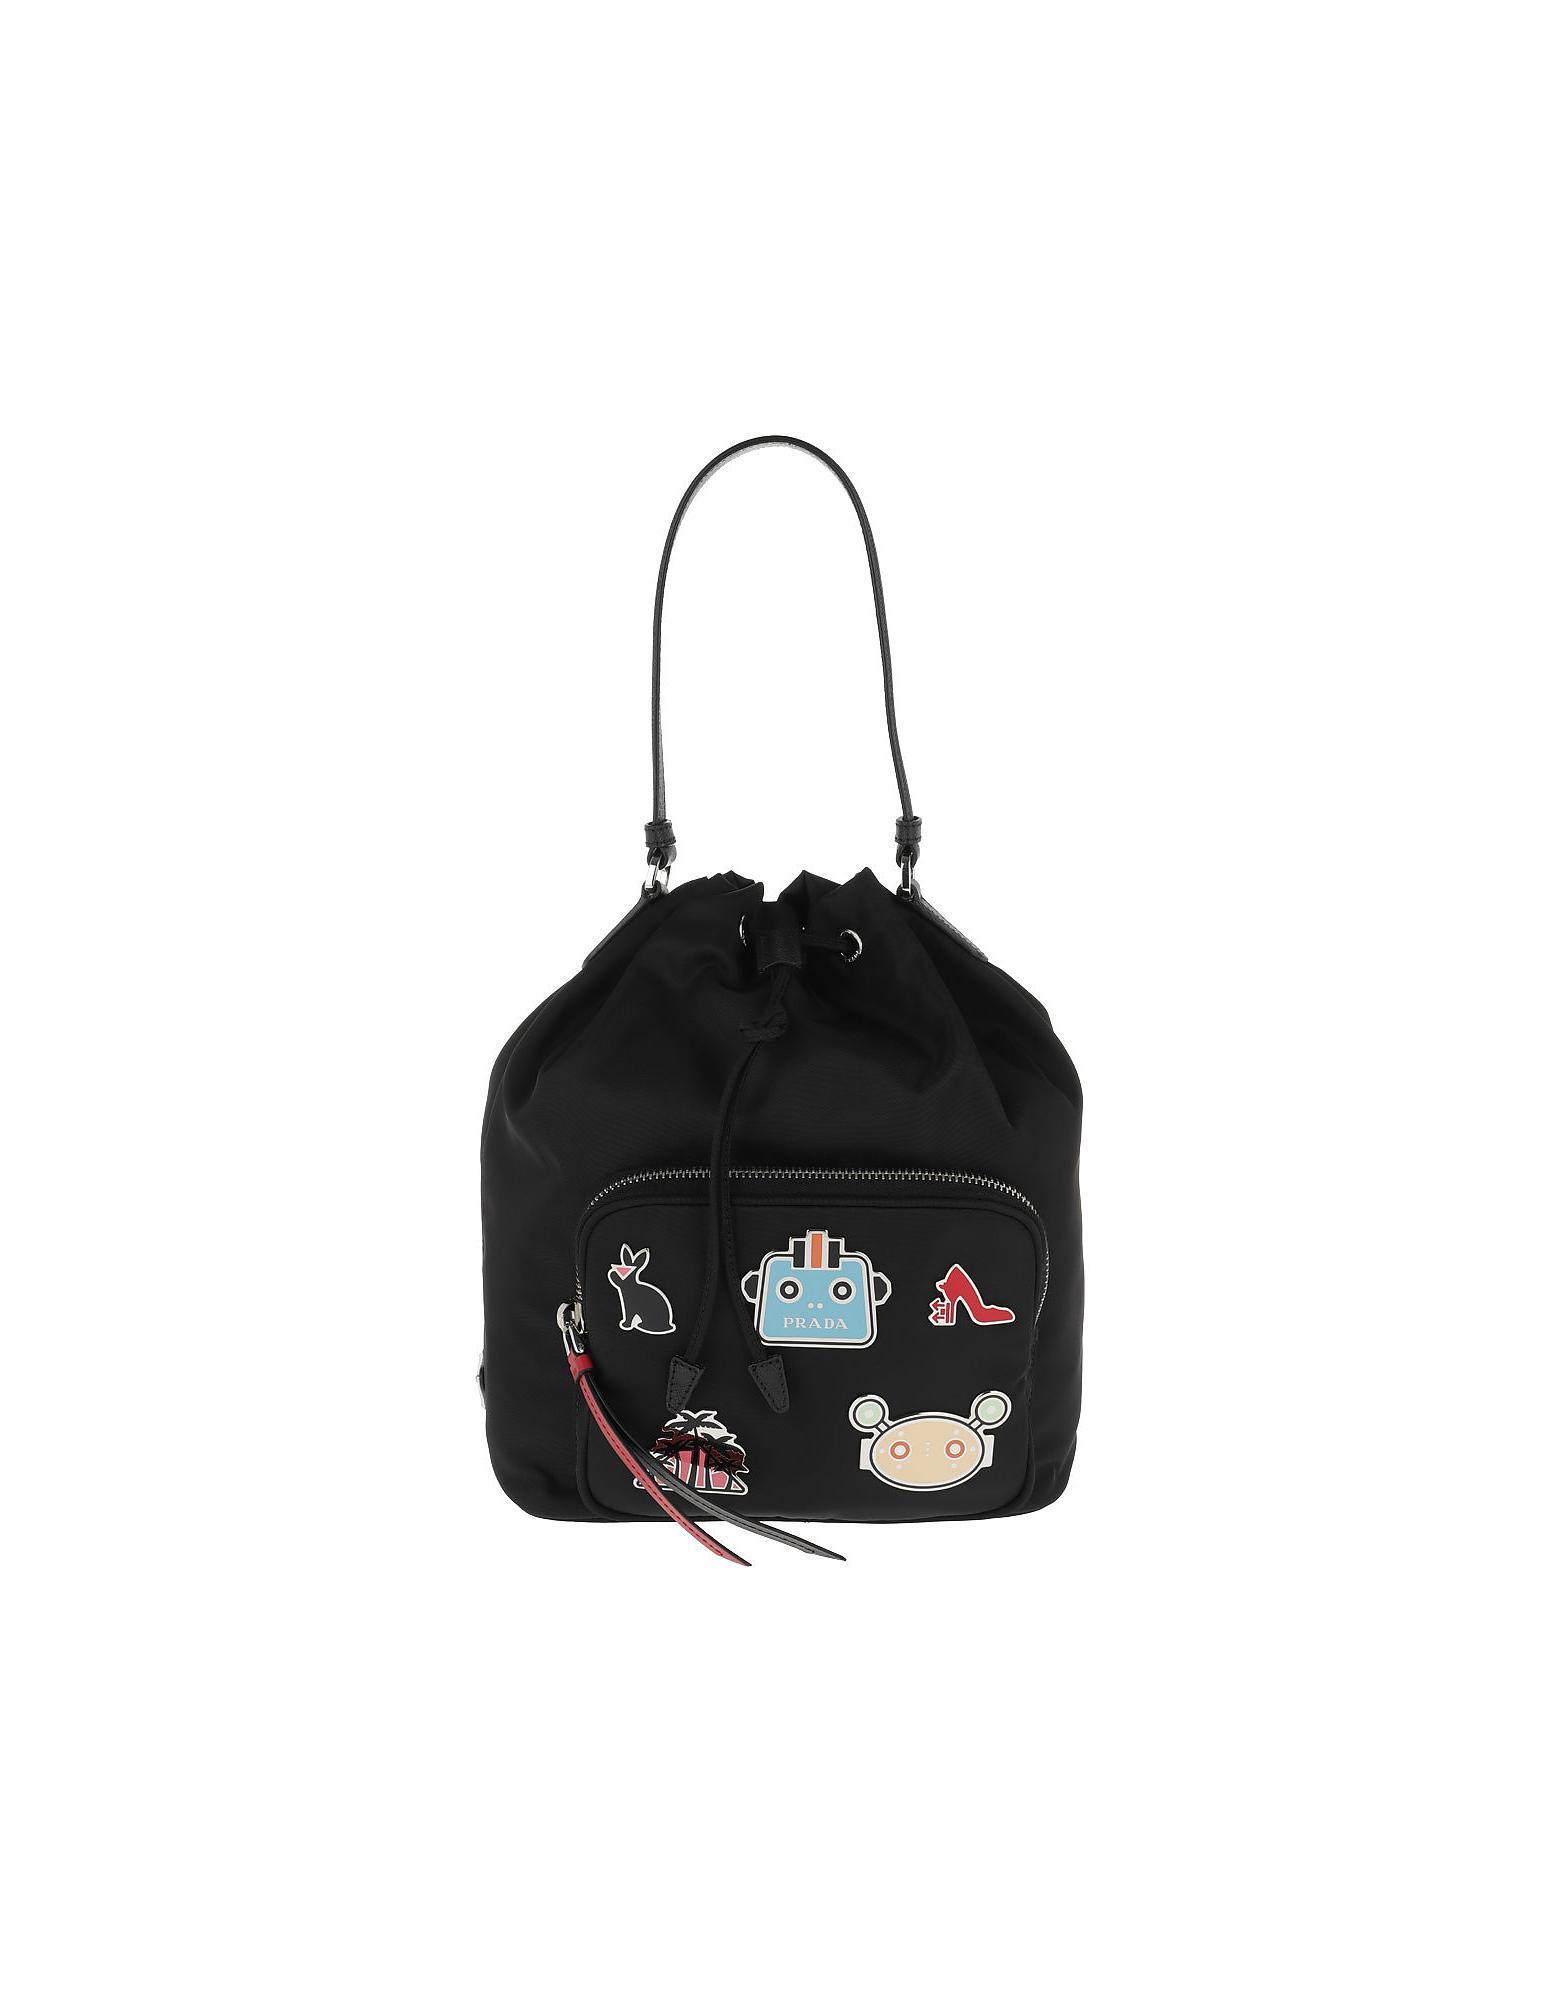 53efd250620603 Prada Nylon Bucket Bag Robot Nero in Black - Lyst